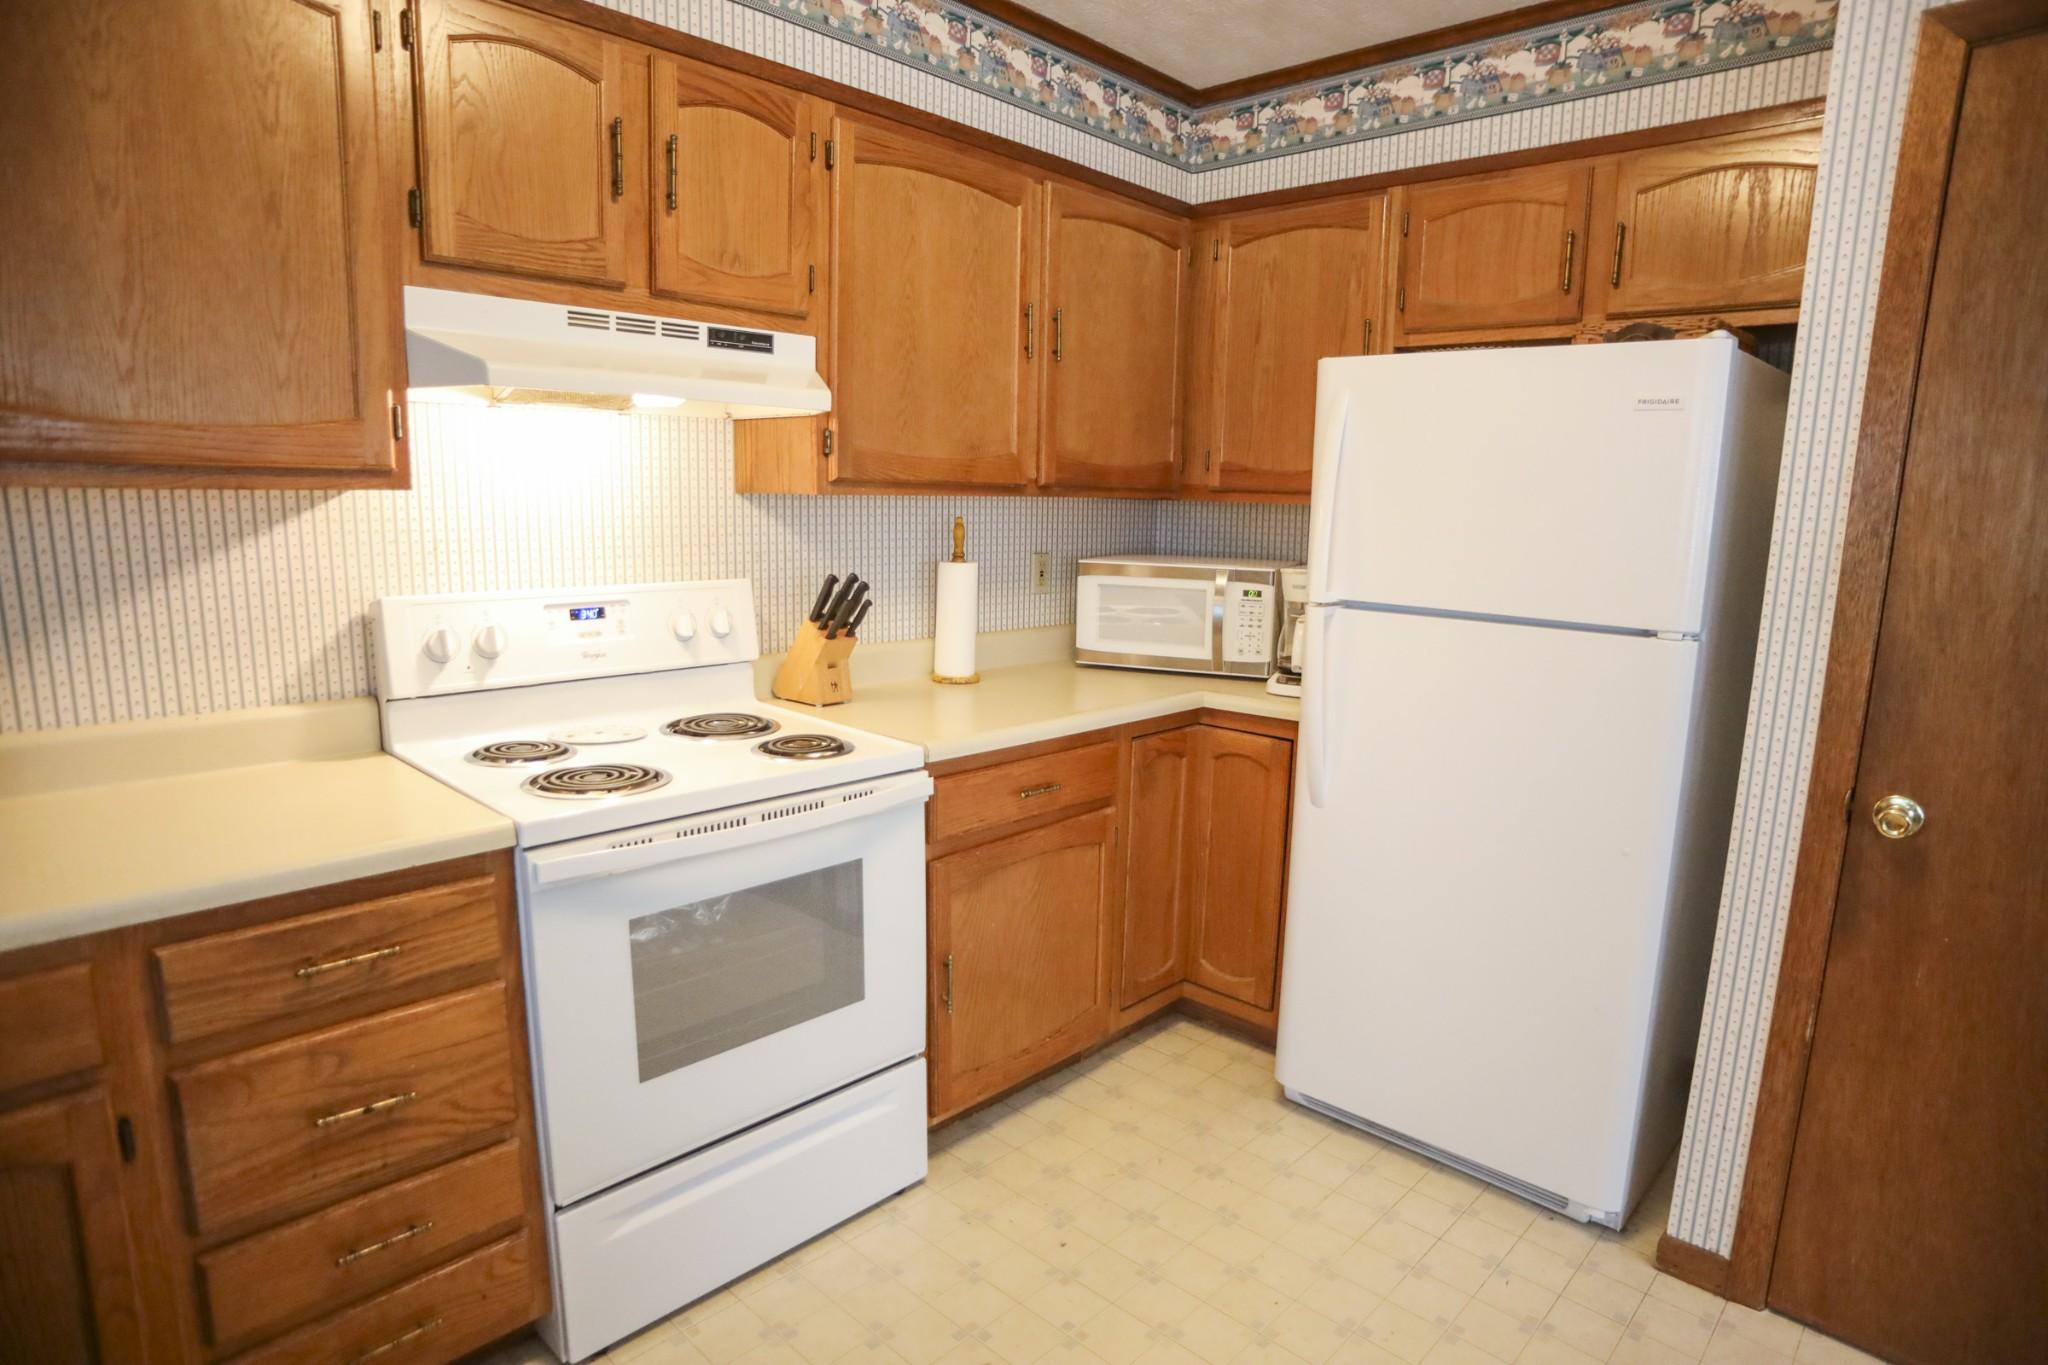 980 Deerwood Dr, Dandridge, TN 37725 - Dandridge, TN real estate listing